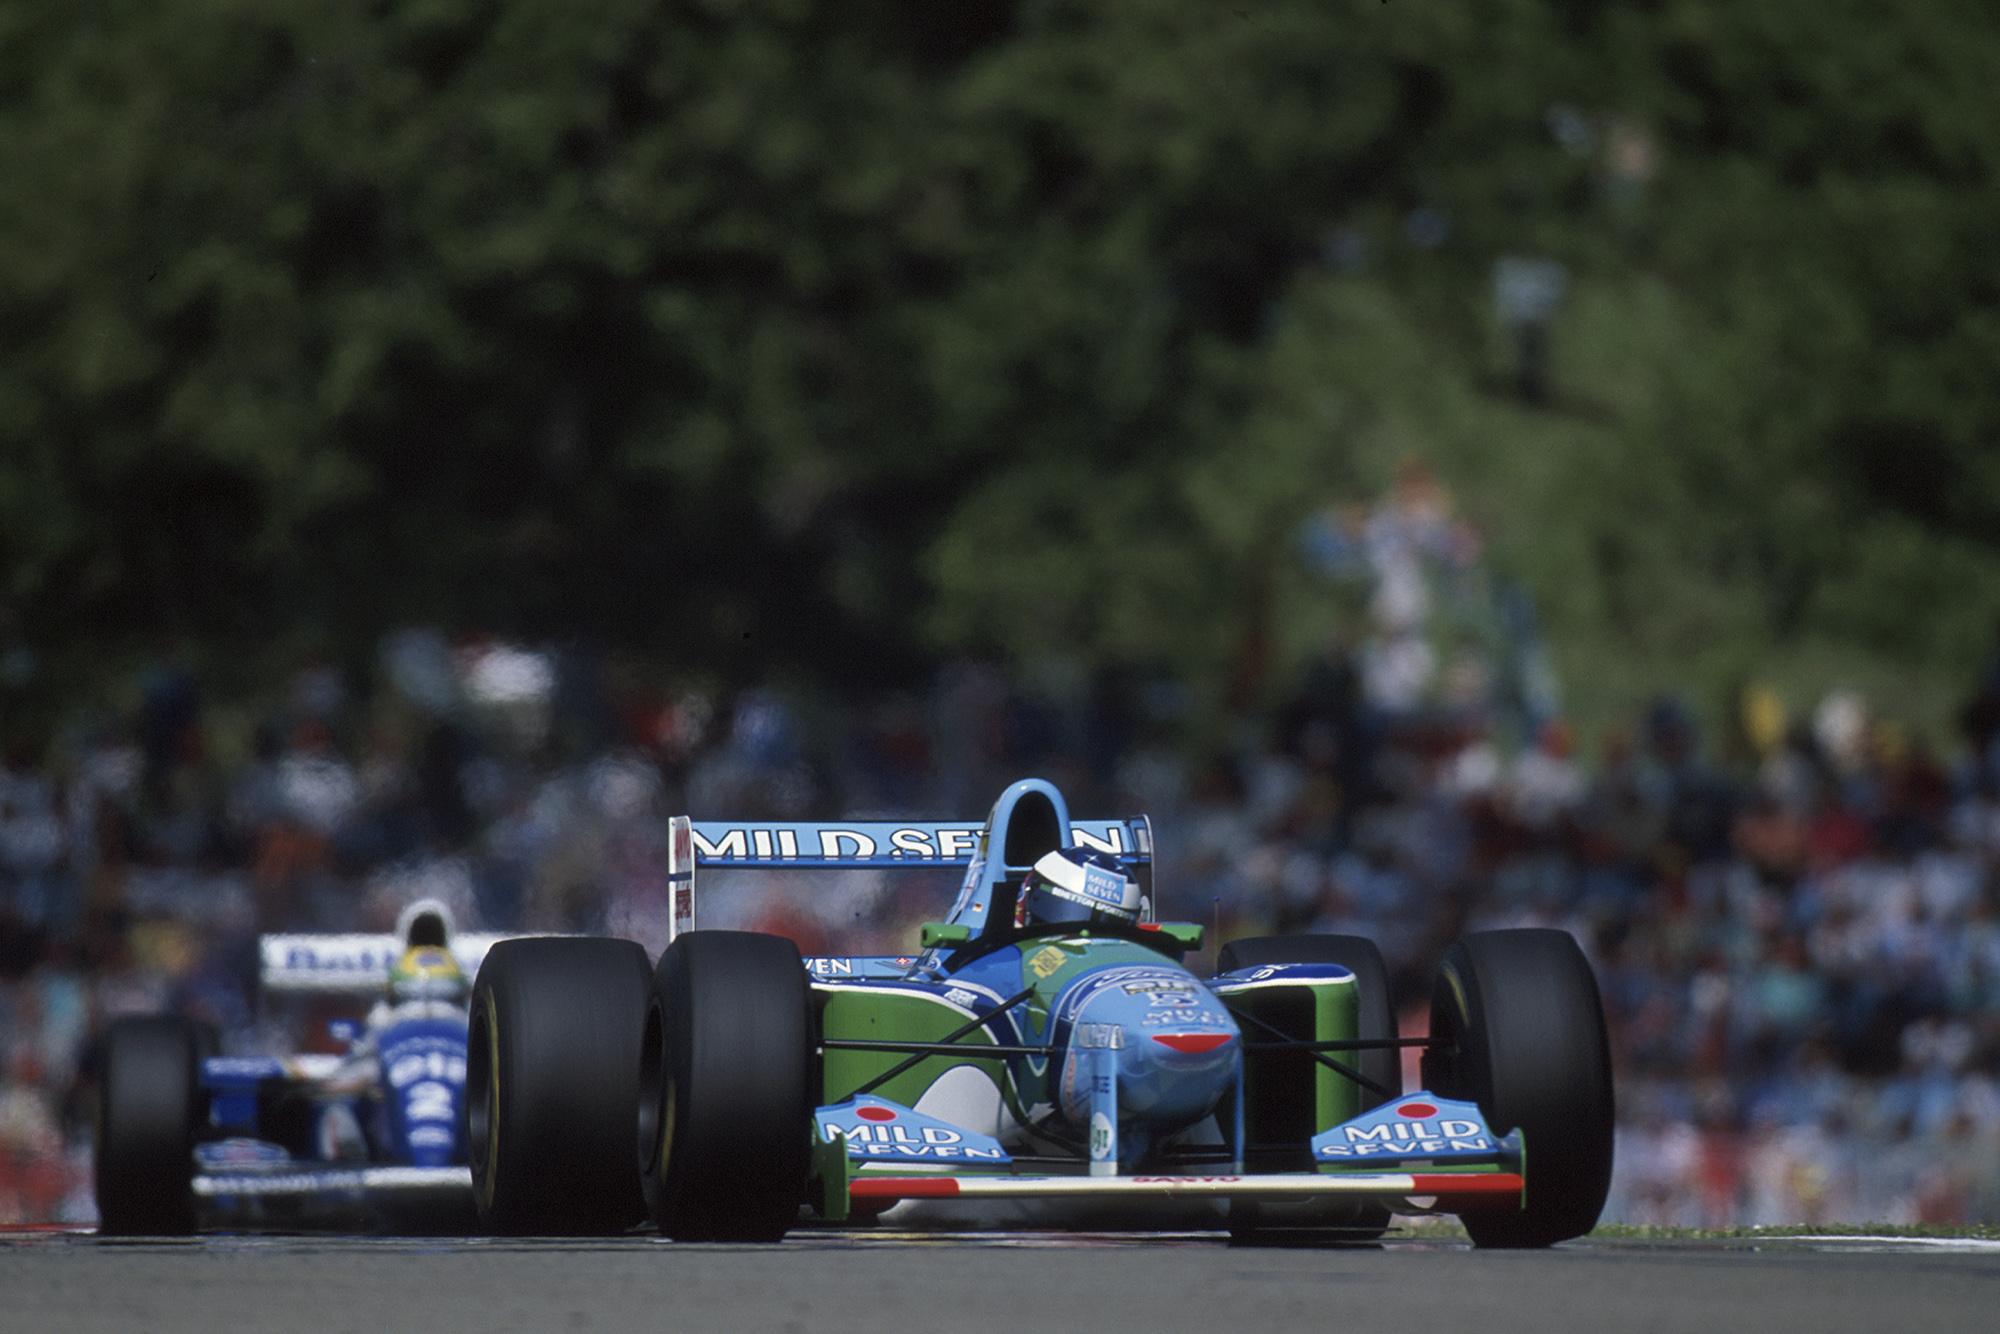 Ayrton Senna follows Michael Schumacher in the 1994 San Marino Grand Prix